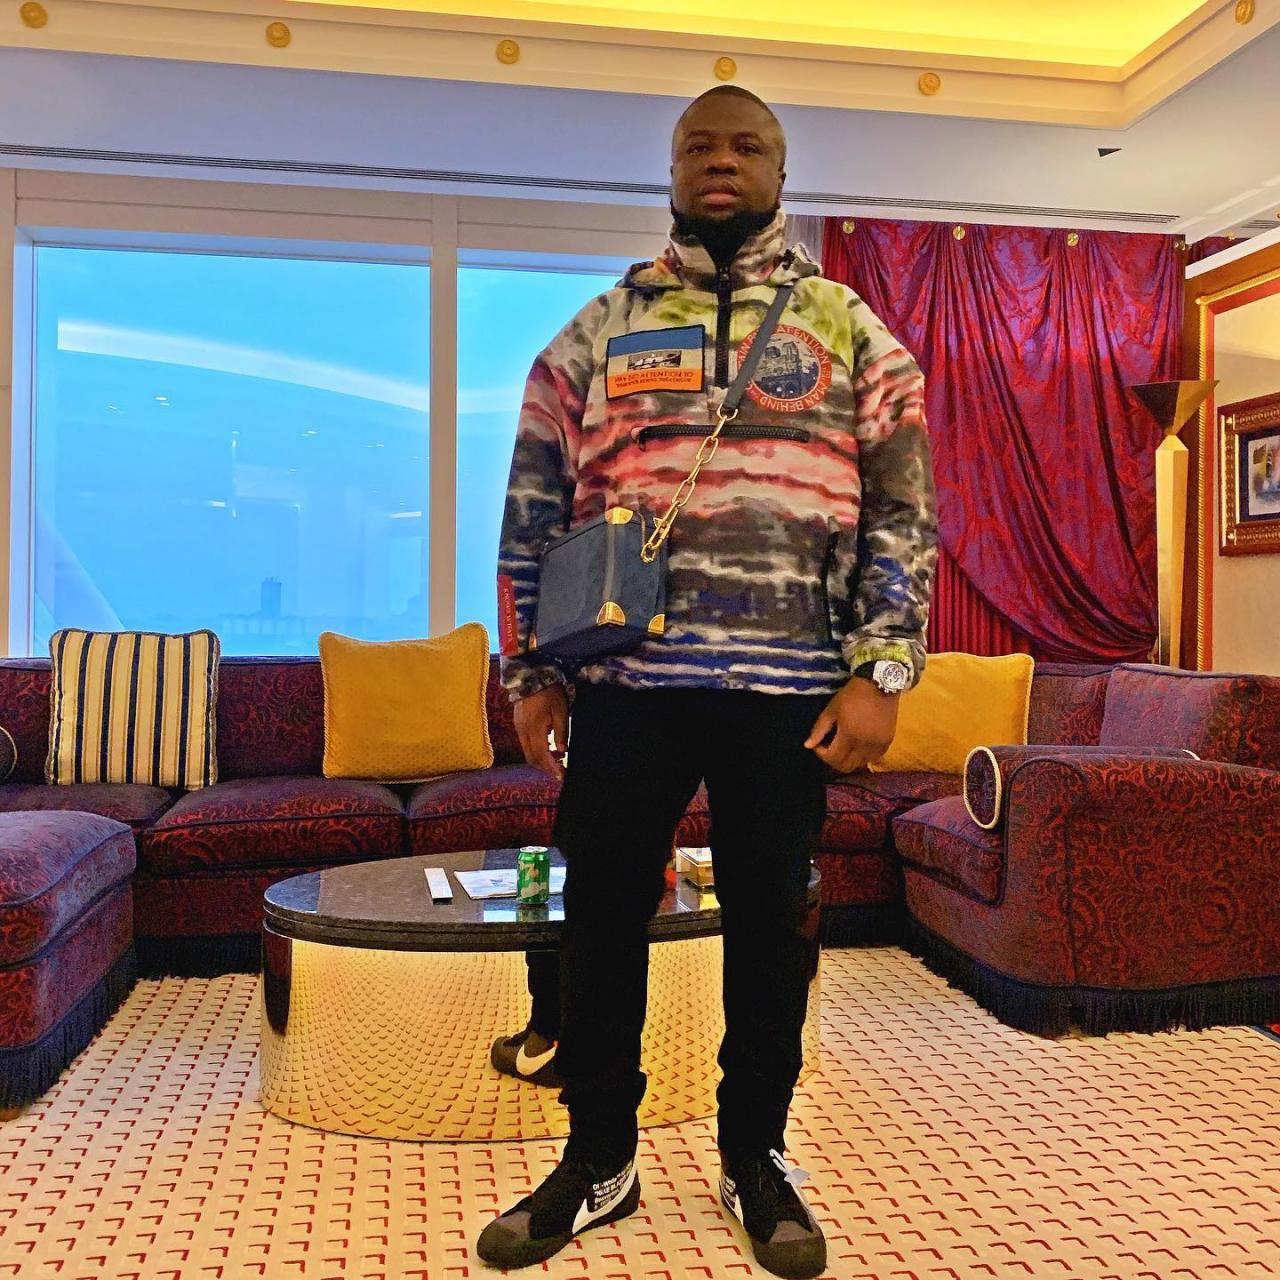 Legit!!! – Hushpuppi shares video of himself enjoying life in a private jet.